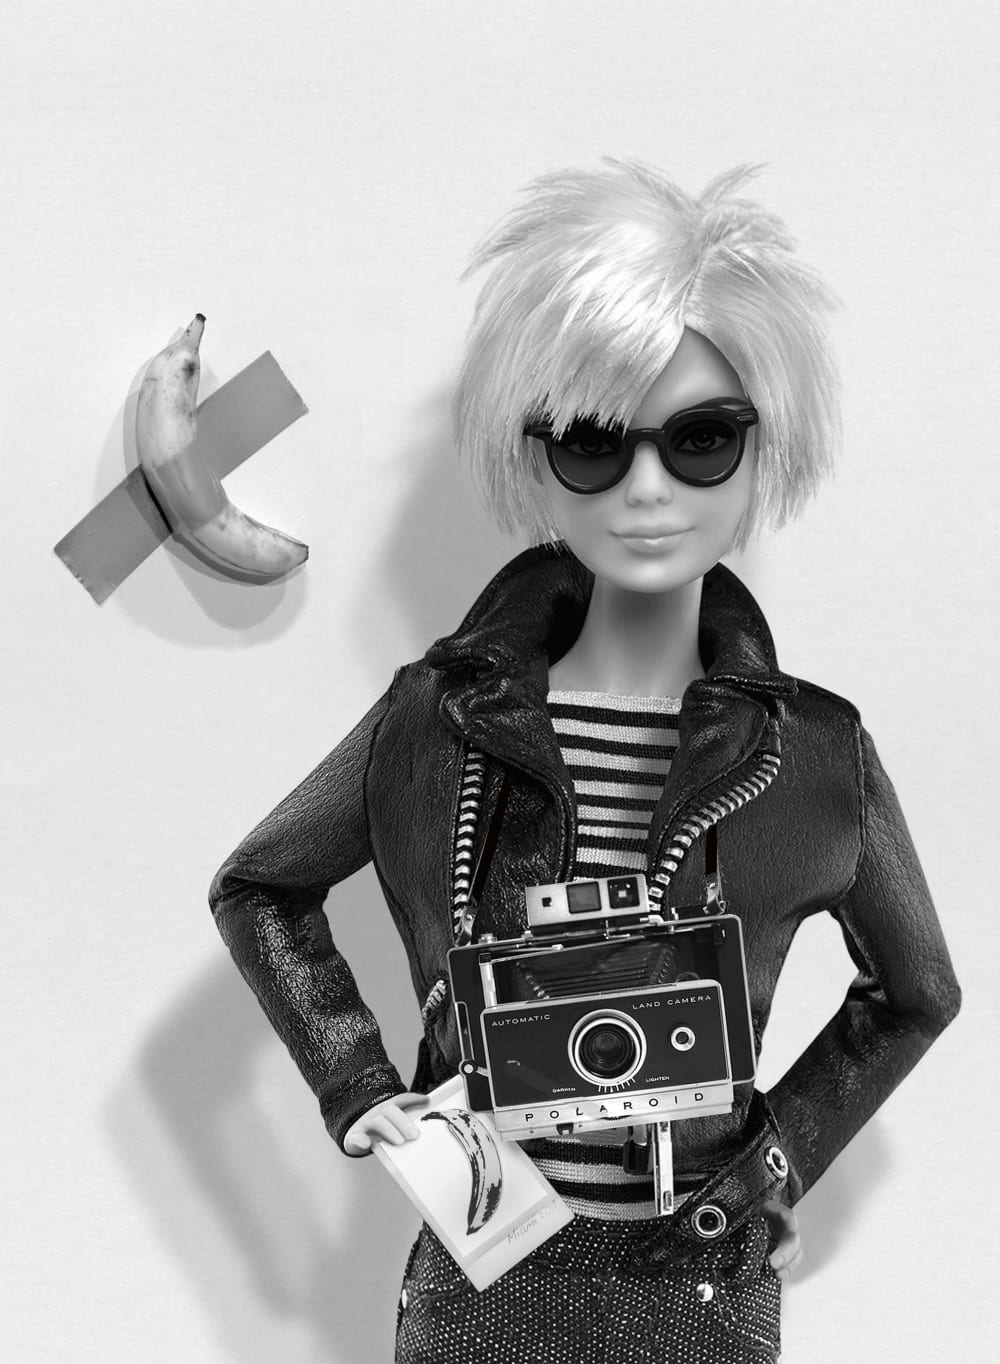 Barbie Andy Warhol Polaroid  - Michel Tréhet